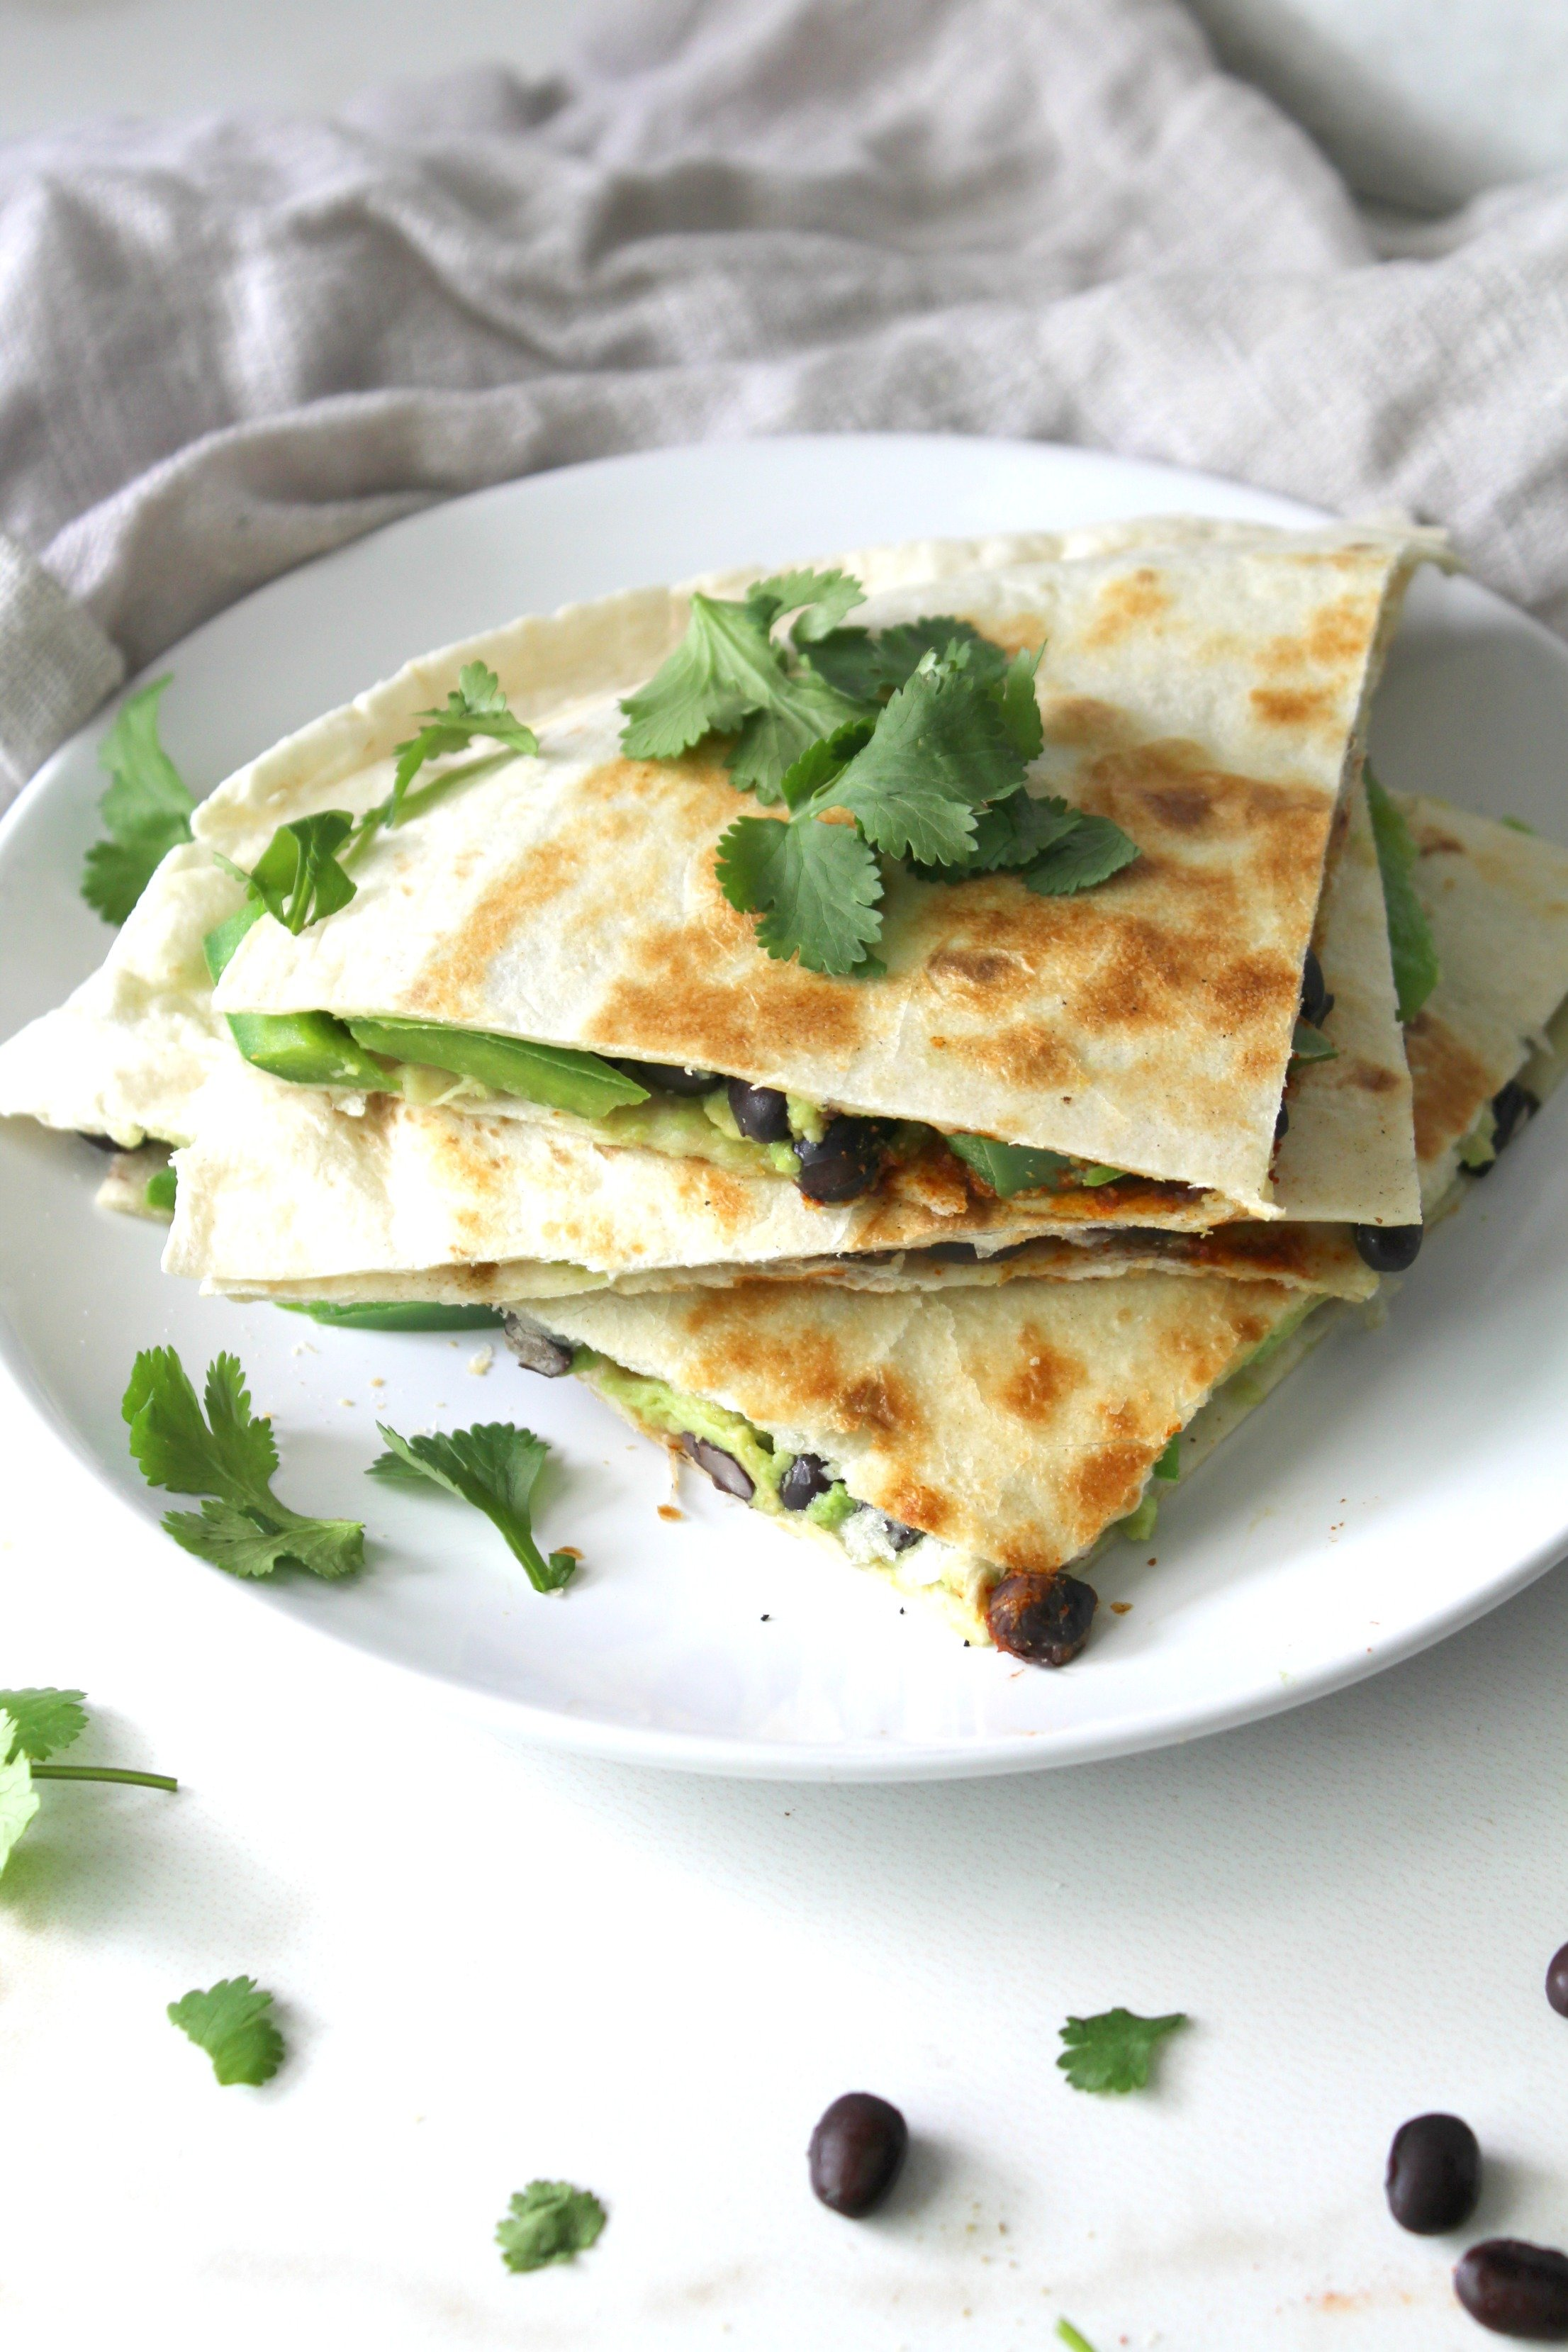 Avocado Black Bean Quesadillas - This Savory Vegan